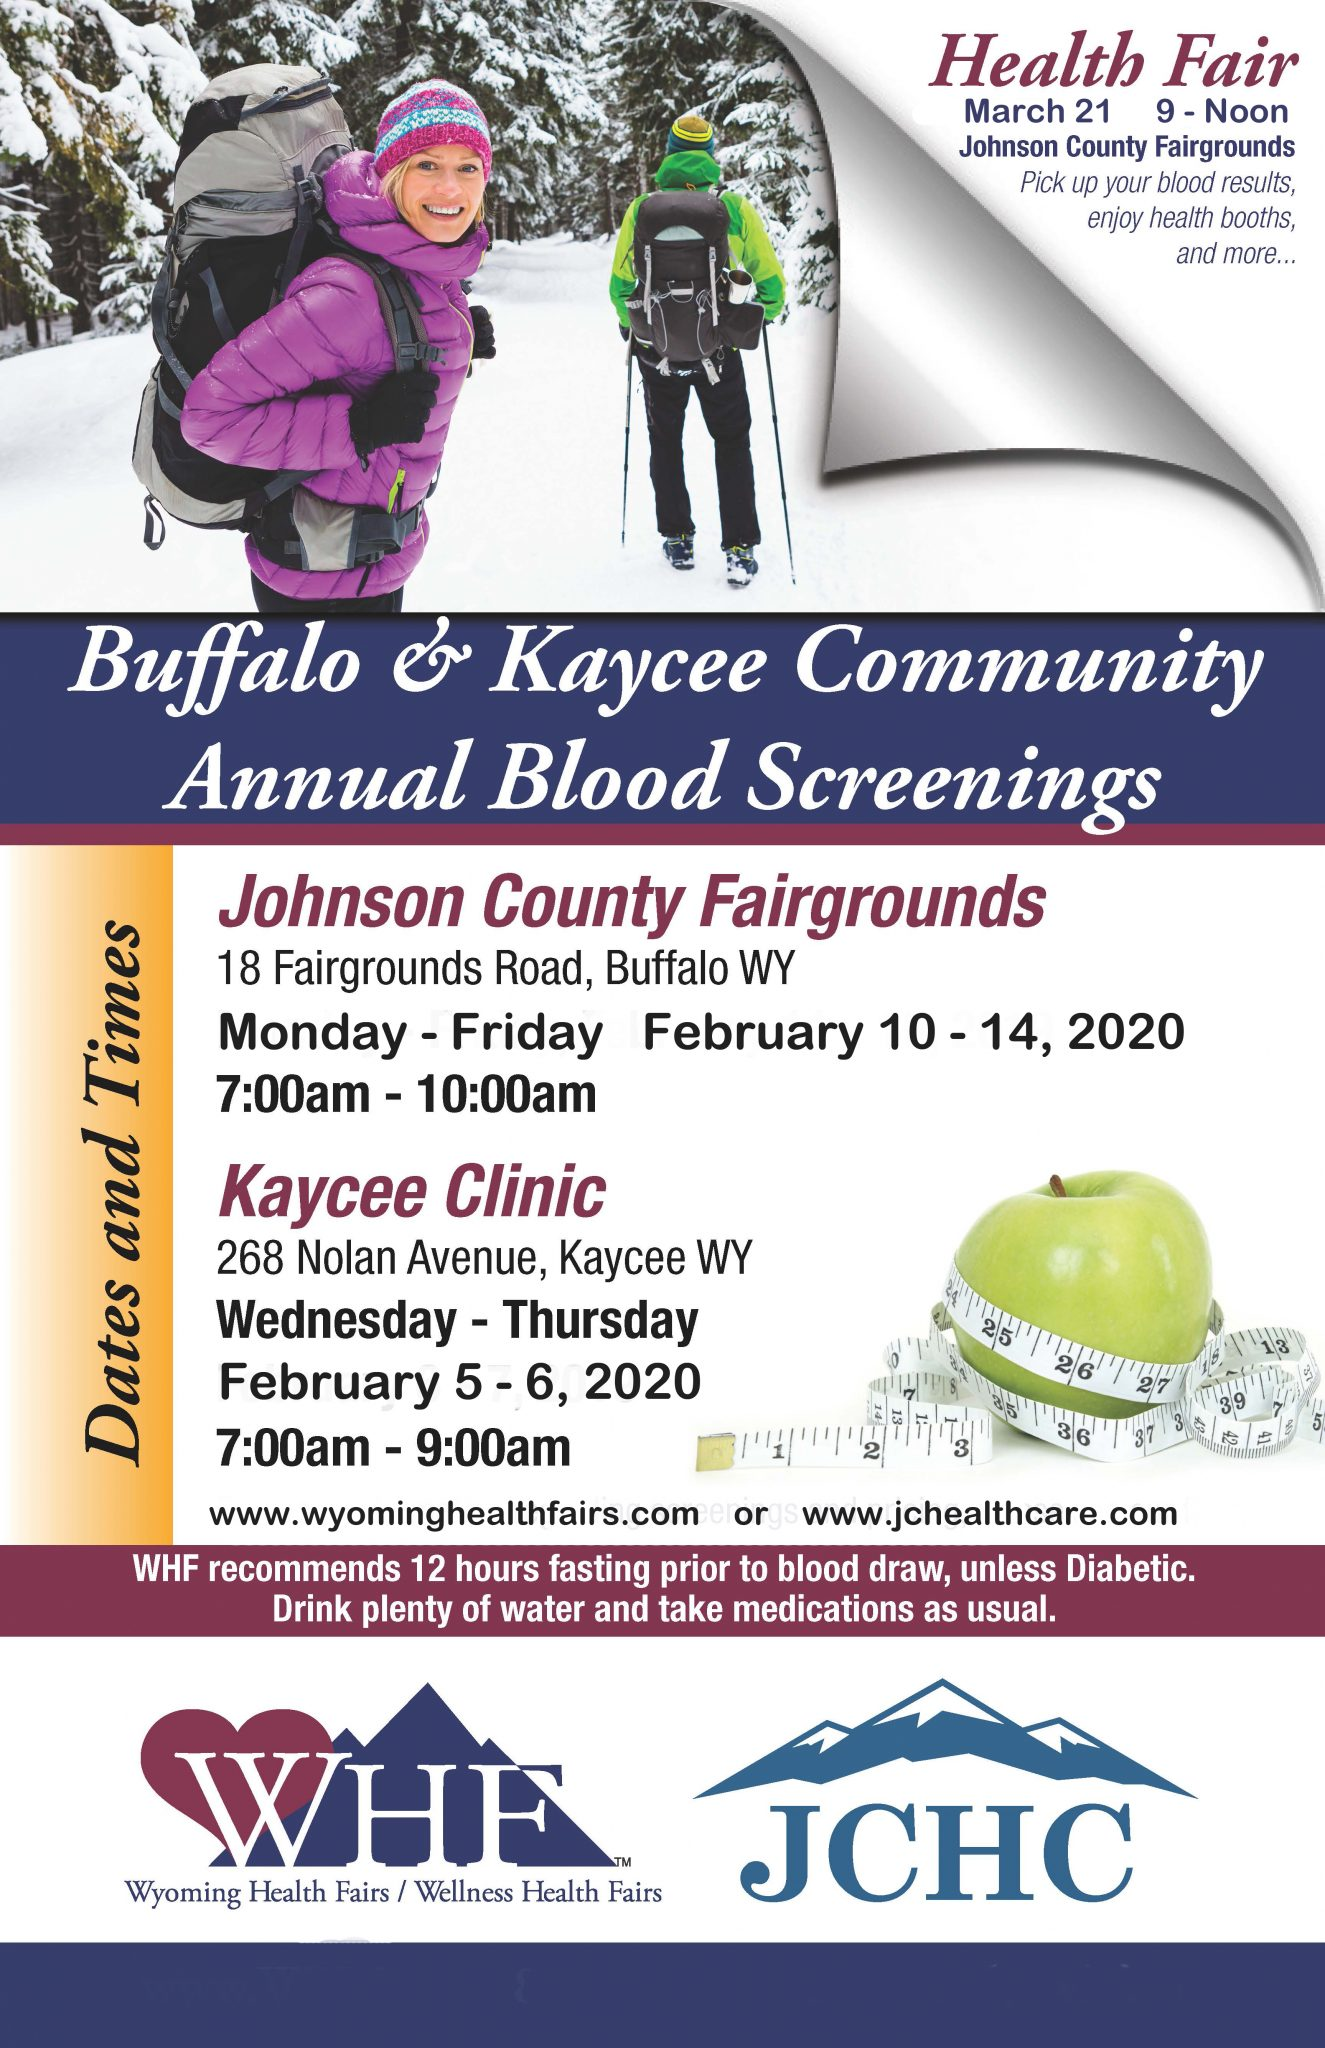 Buffalo_Kaycee Community Event Poster 2020